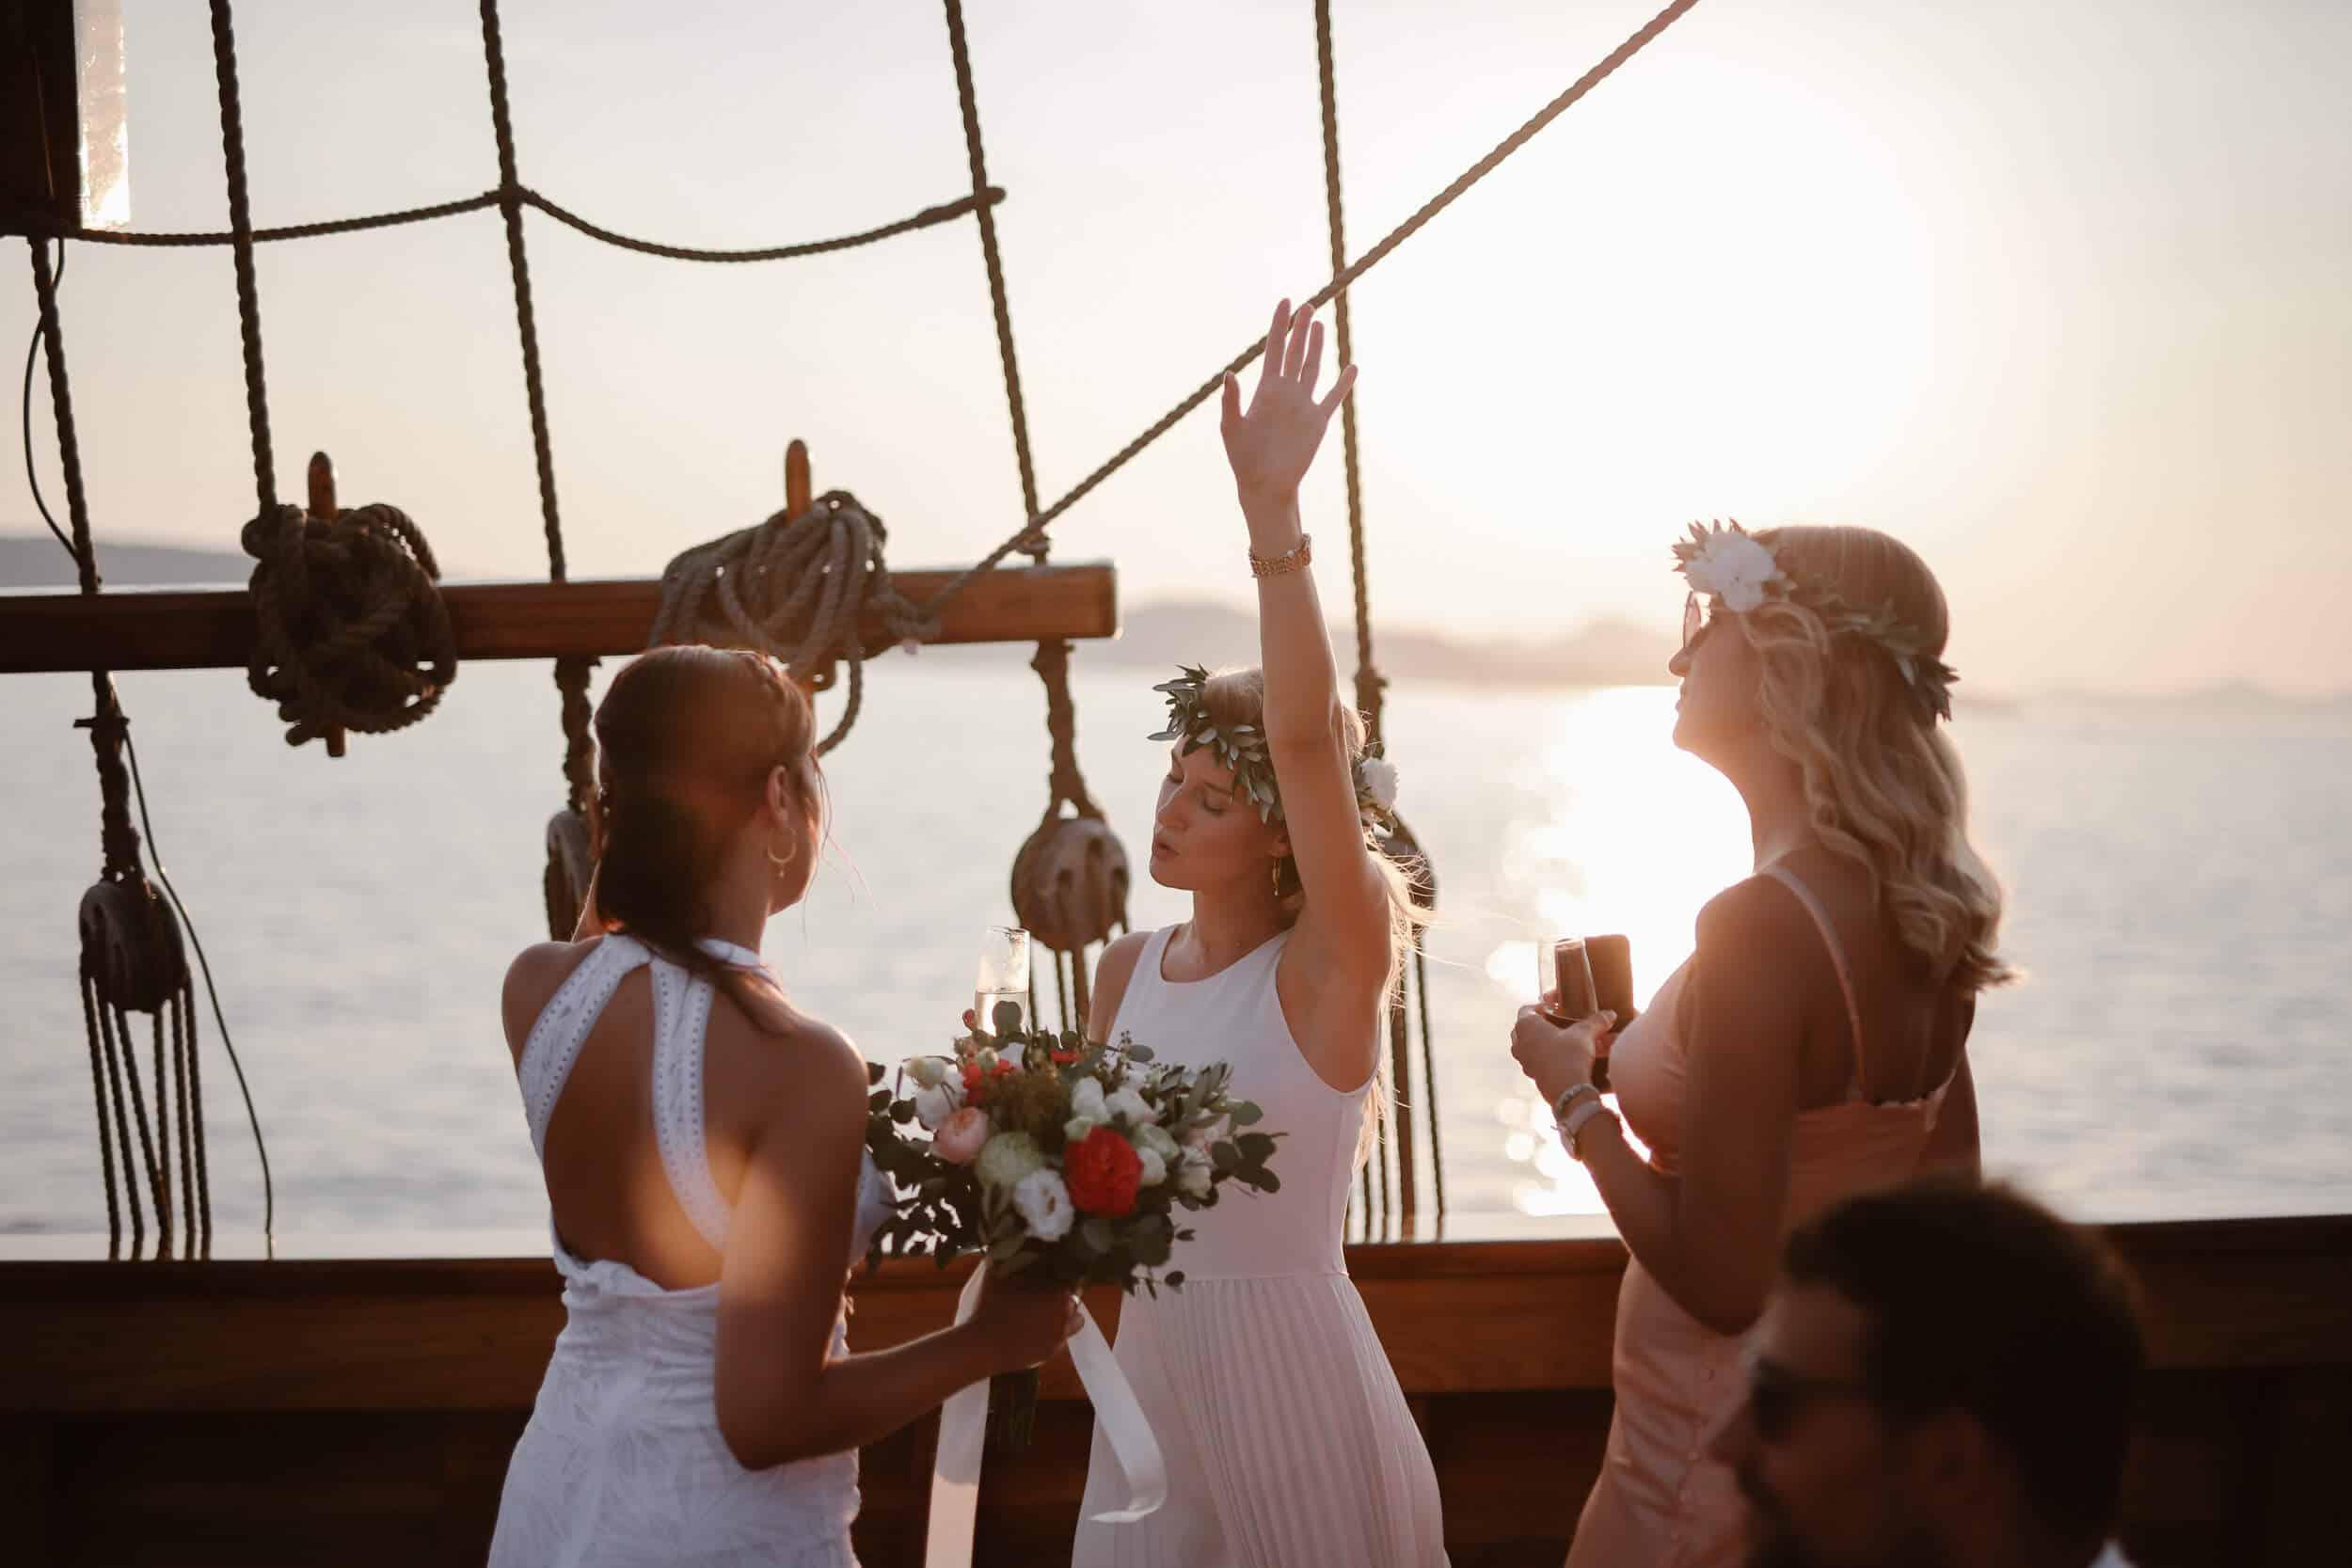 Dubrovnik karaka boat elopement matea stephan 10 | Croatia Elopement Photographer and Videographer